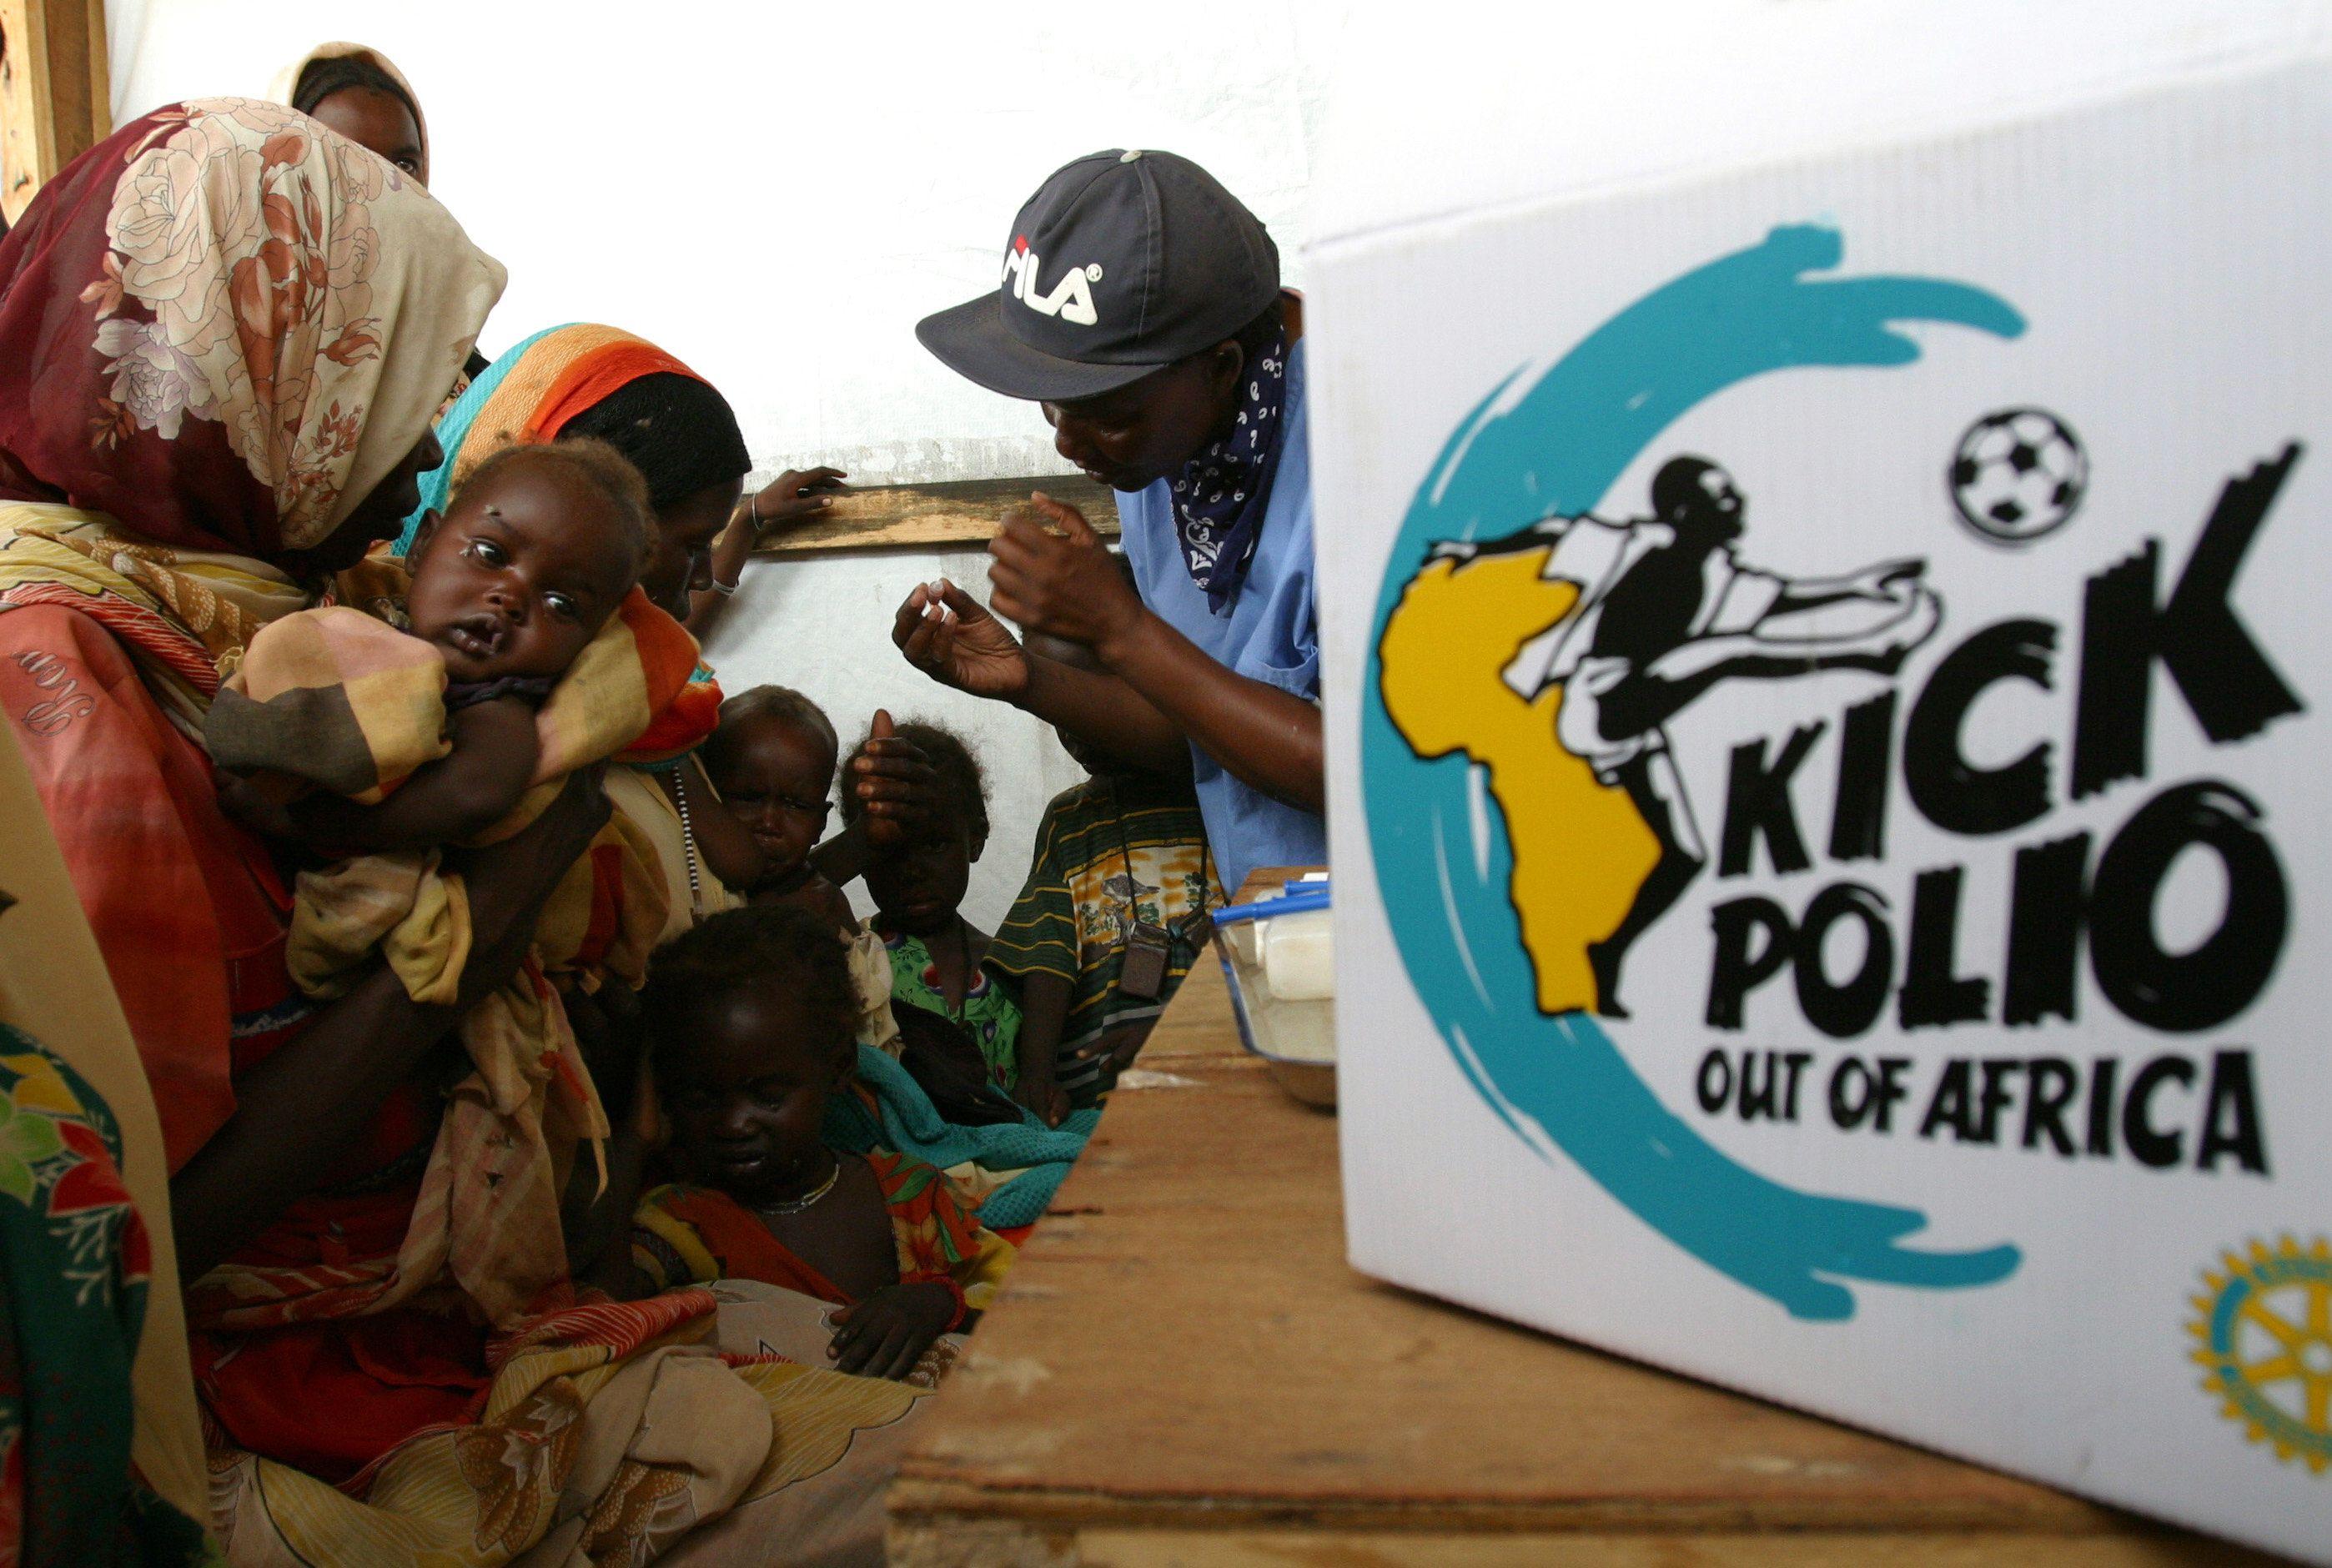 Coronavirus Politics Daily: Polio eyes a comeback in Africa, Malawi's corona mess, America's economic bounce back